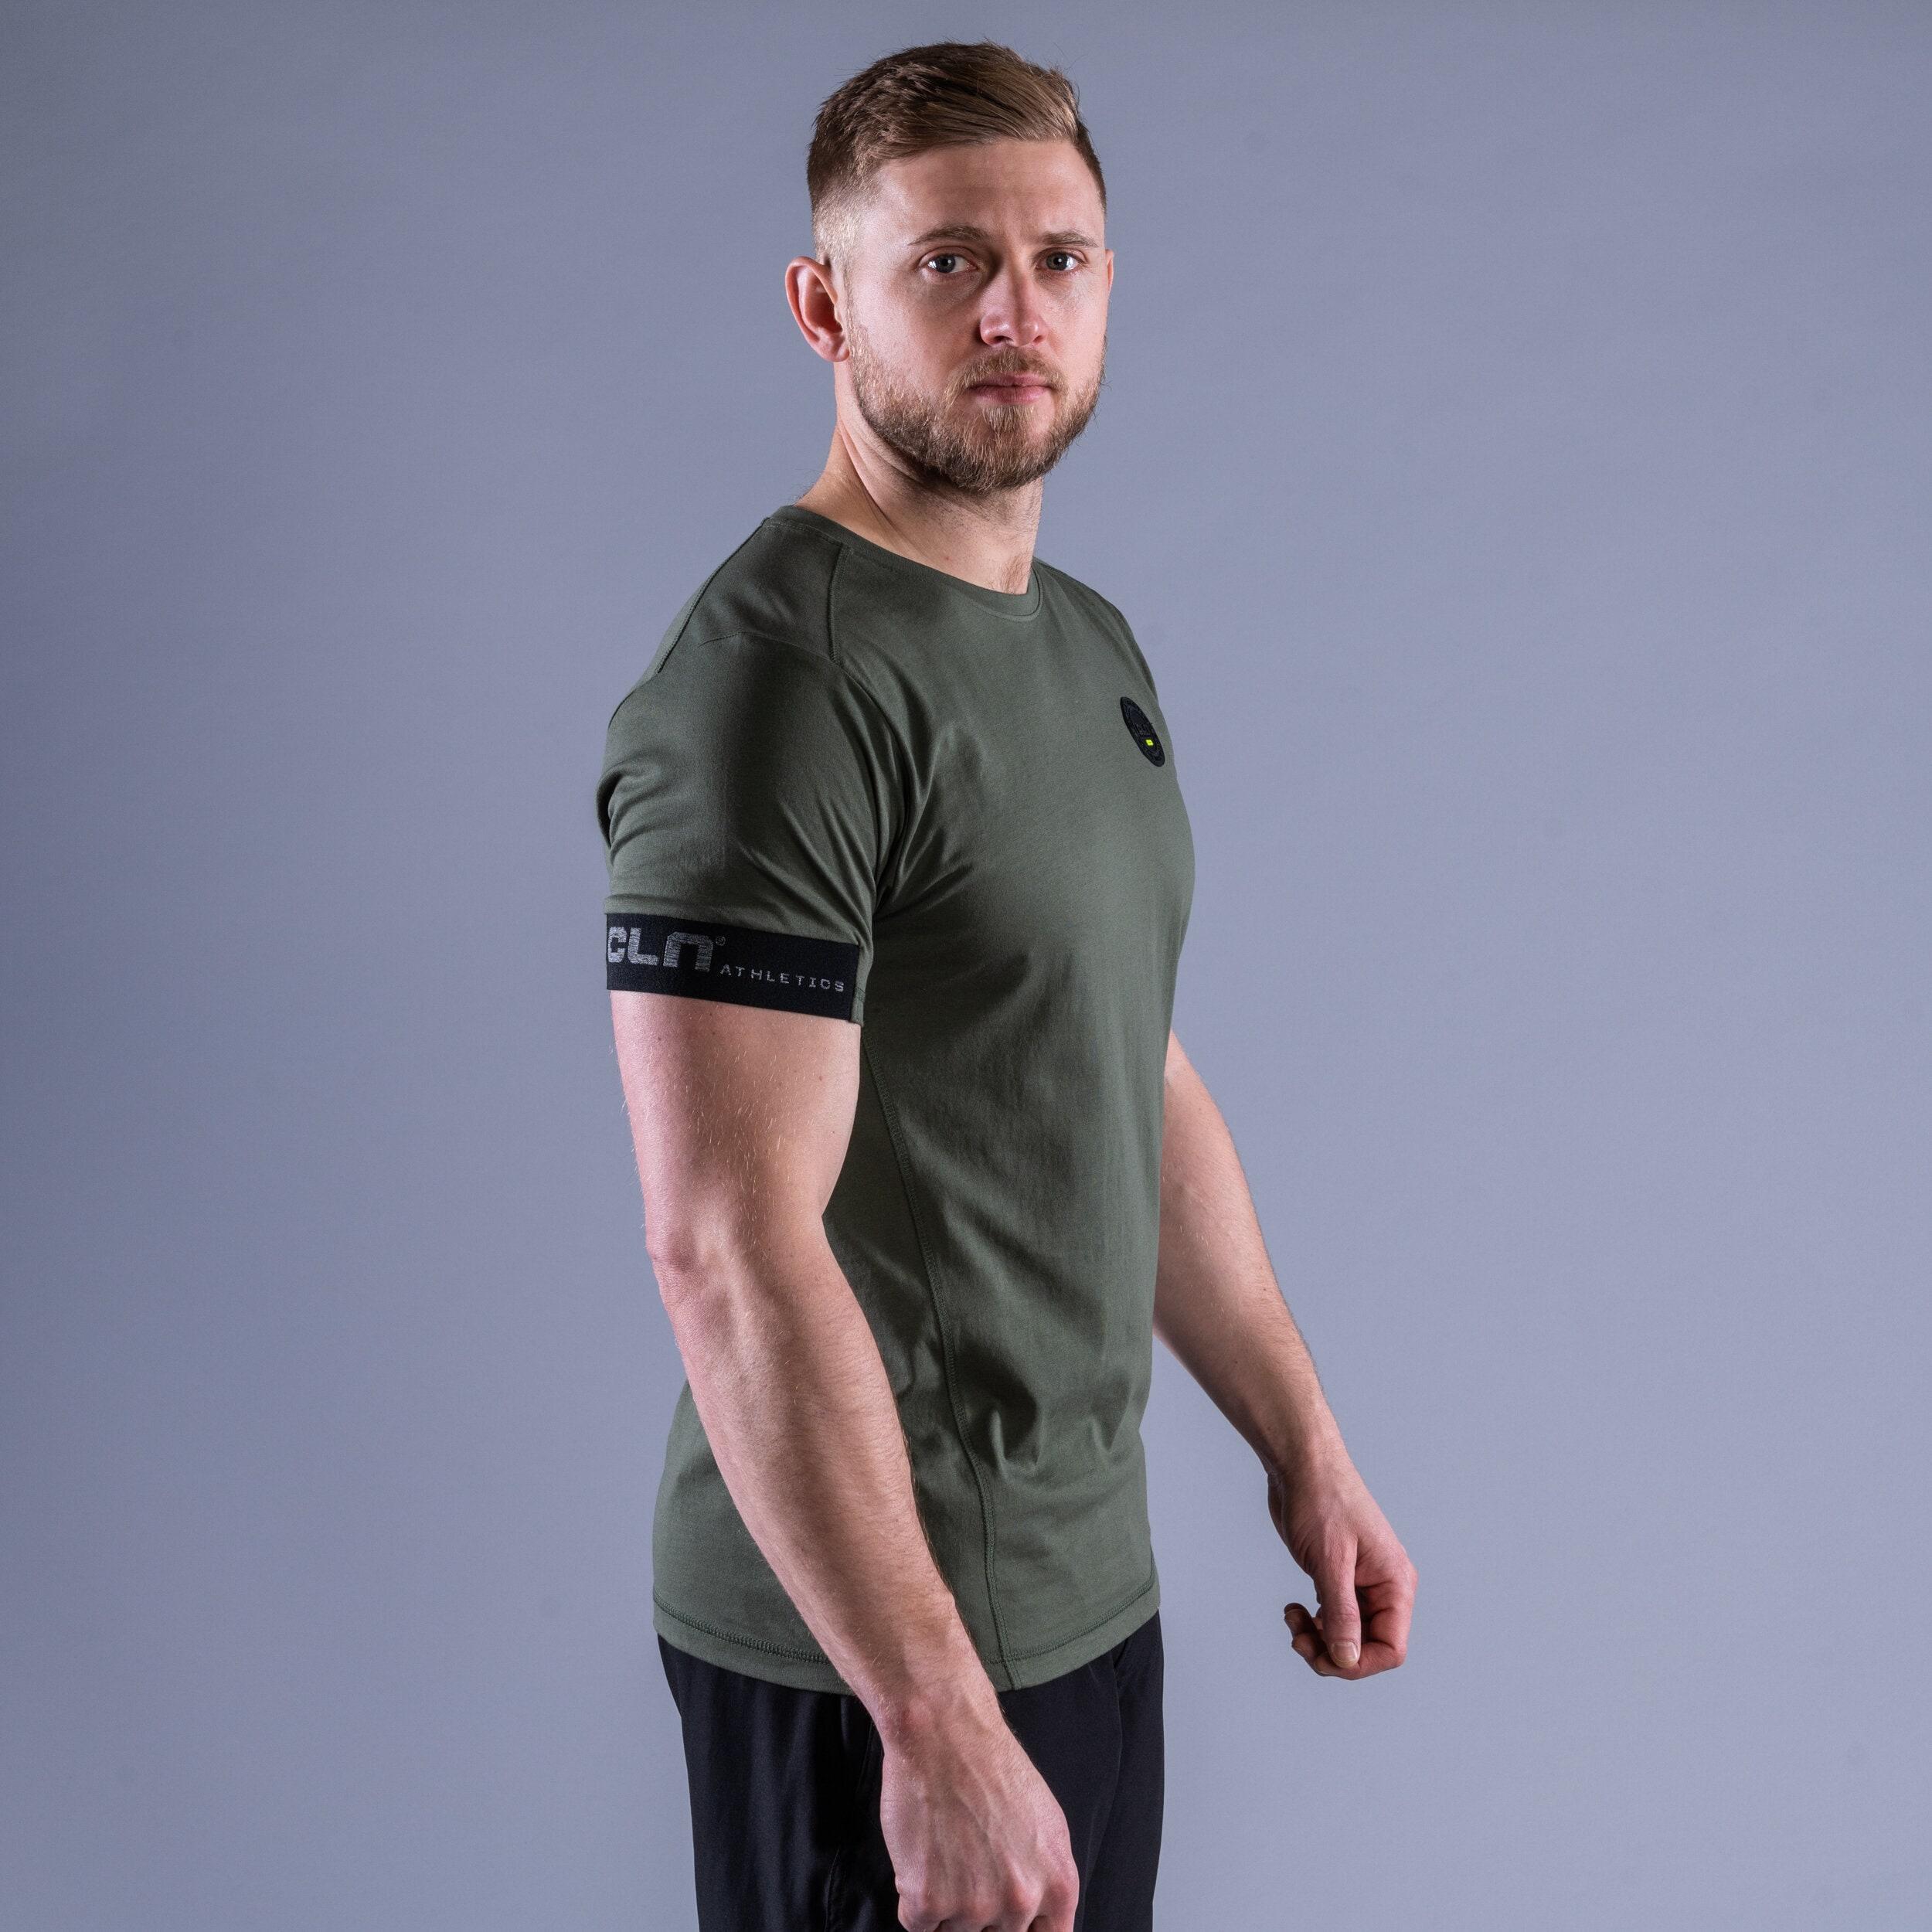 CLN Rush t-shirt Moss green